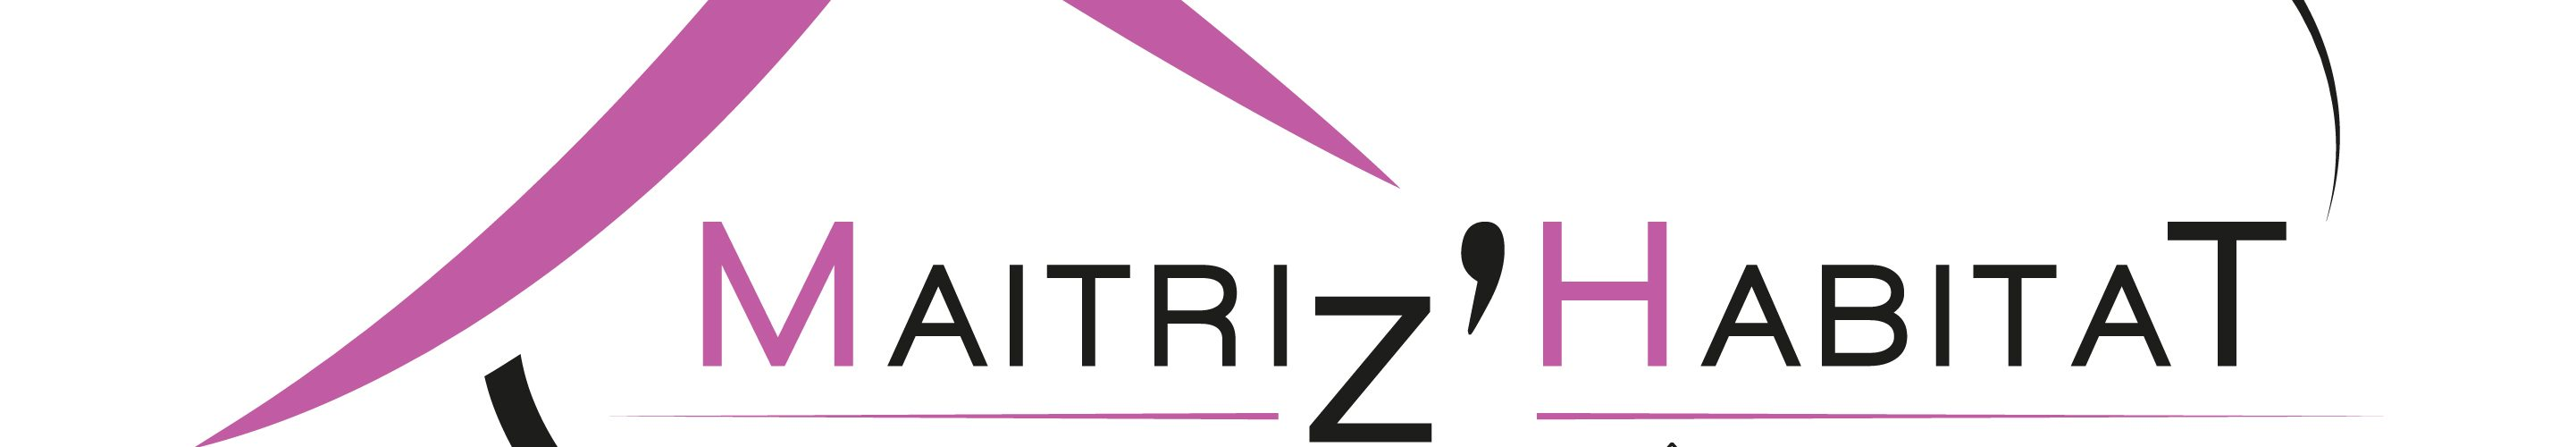 Refonte logo MaitriZ-HabitaT version Couleurs